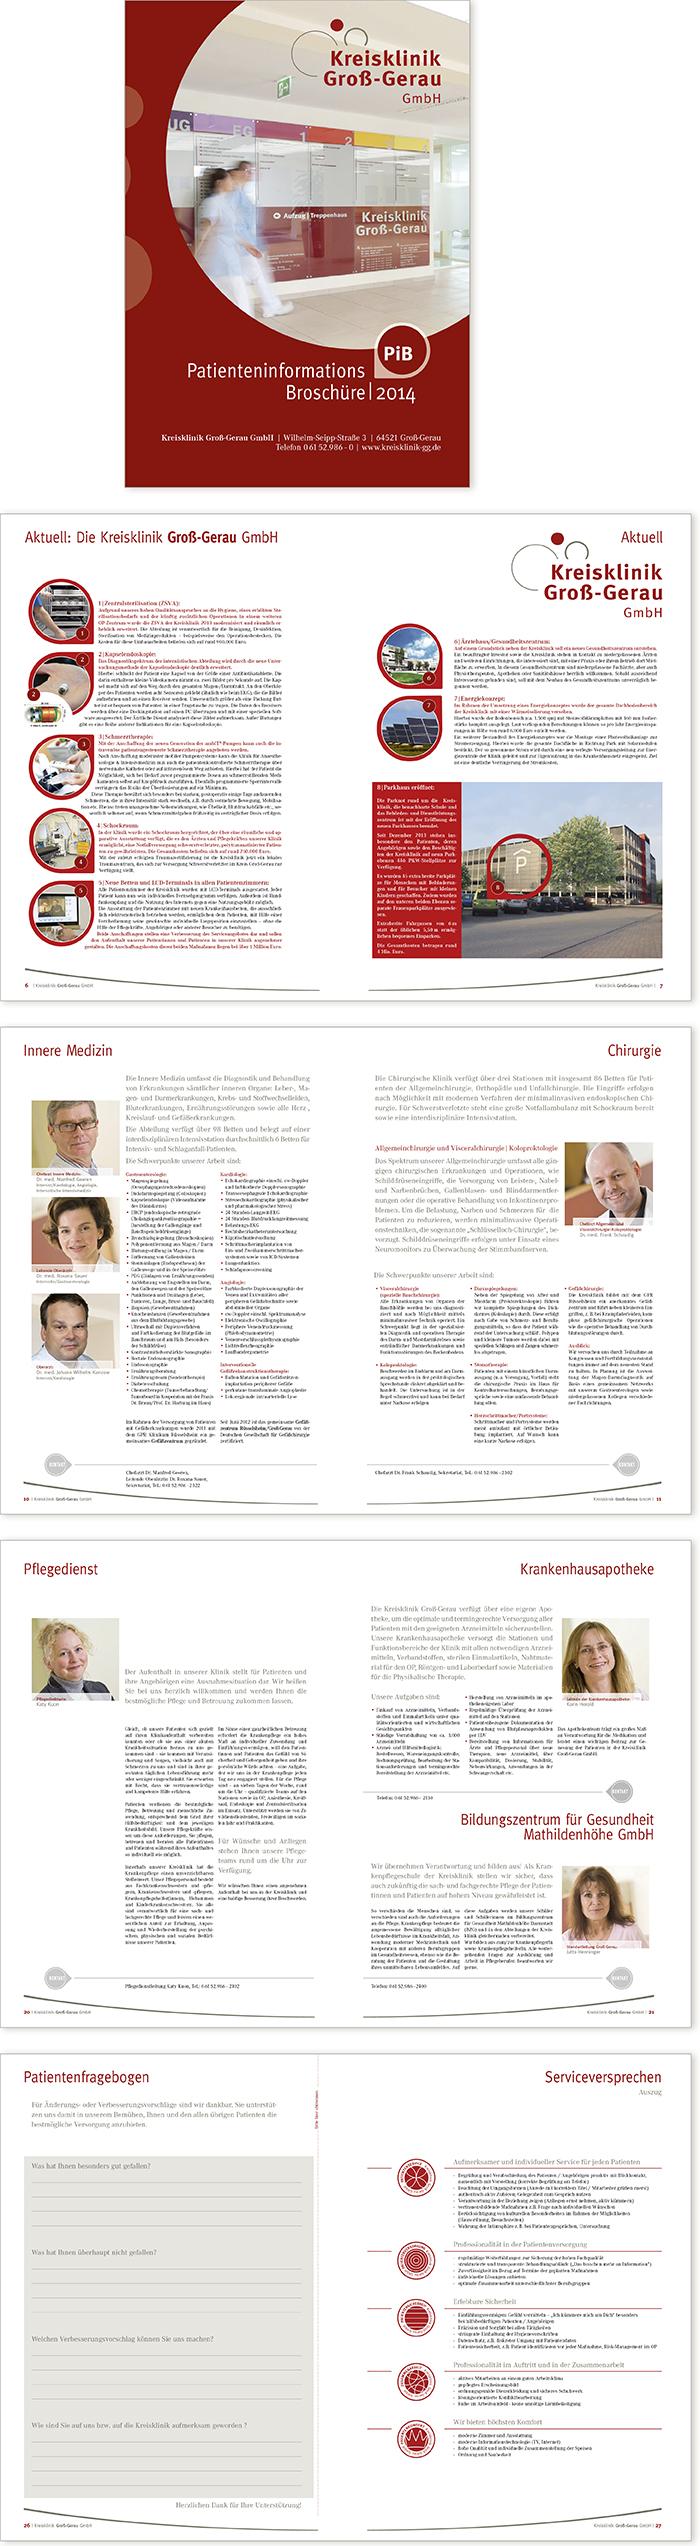 Kreisklinik Groß-Gerau  Gestaltung Patientenbroschüre